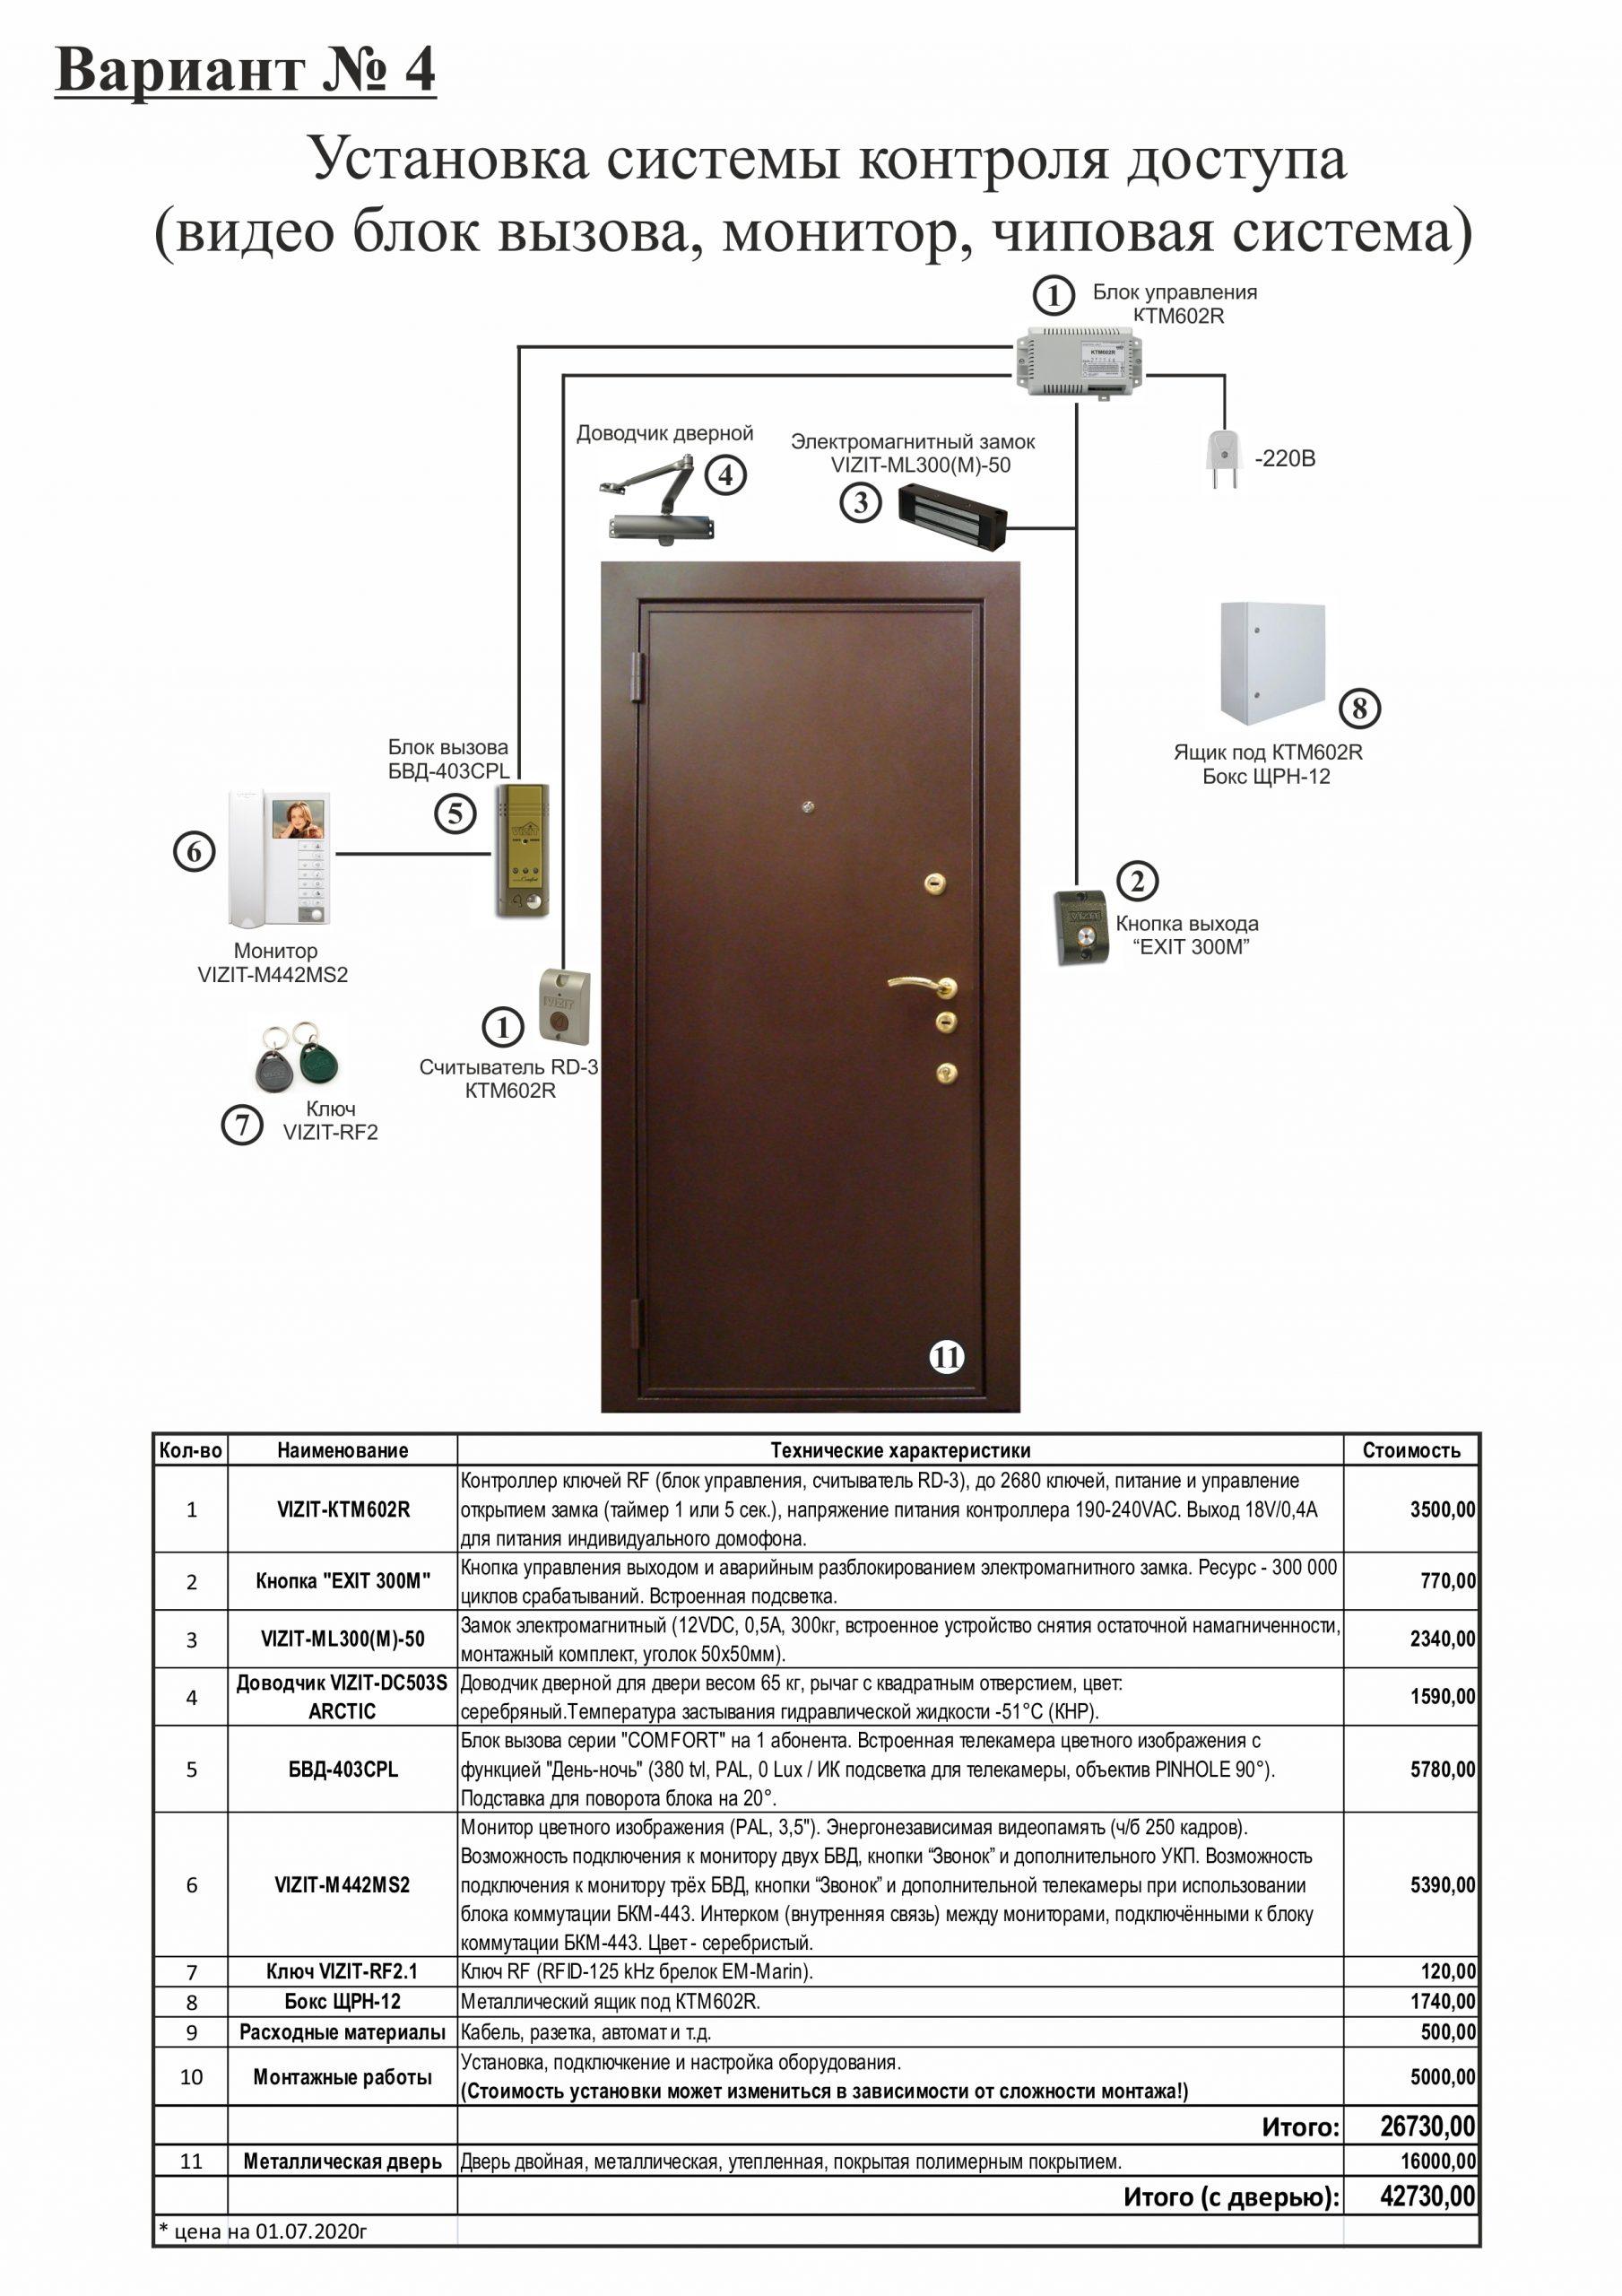 Установка КТМ602R, БВД-403CPL и Монитора VIZIT-М441MG